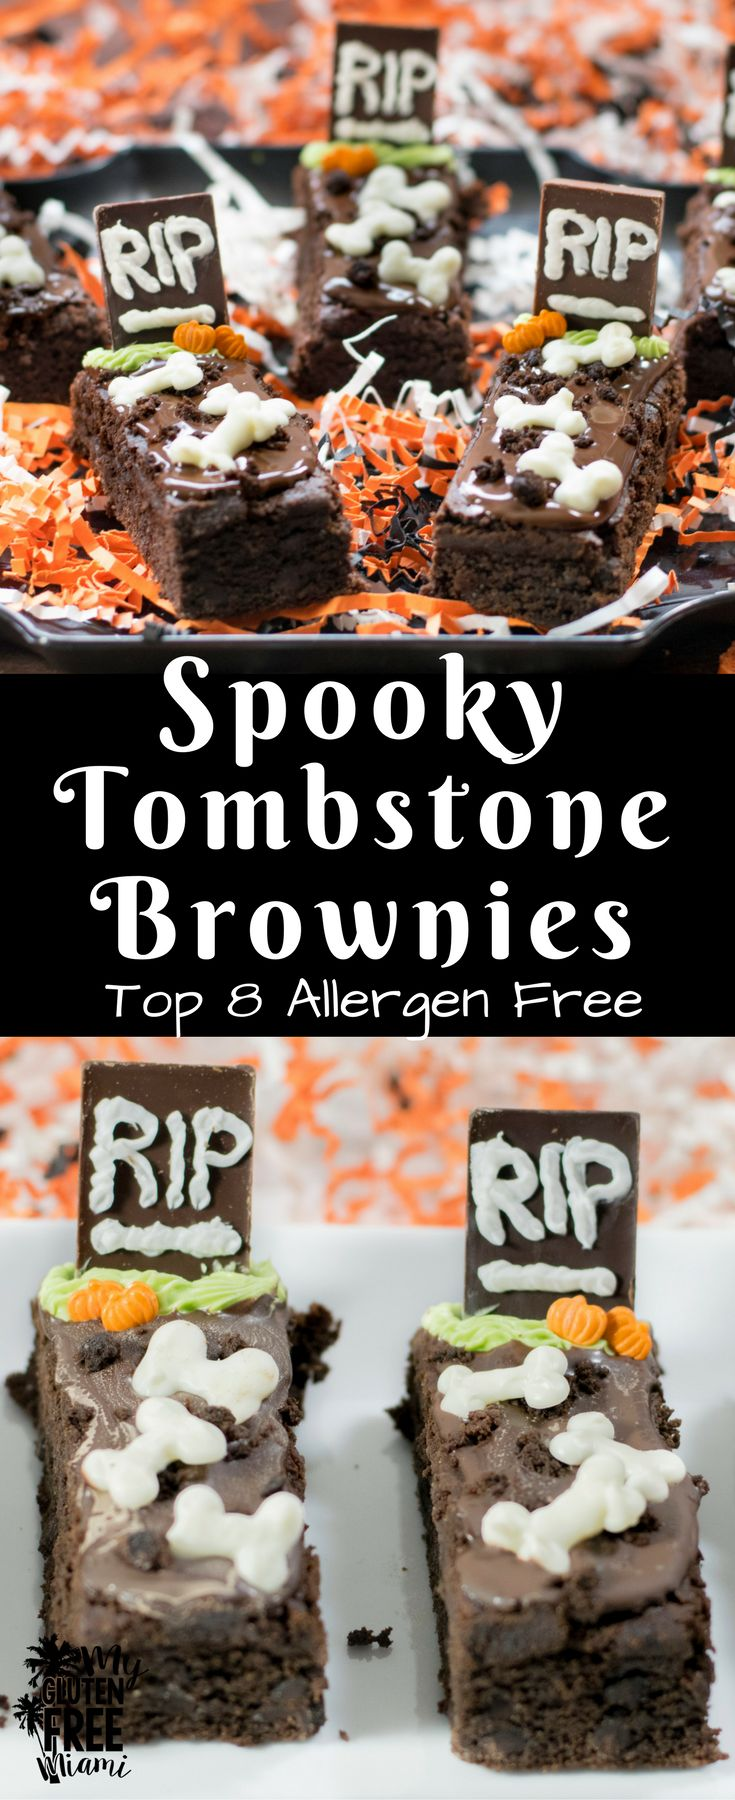 Gluten Free Tombstone Brownies, spooky top 8allerg…